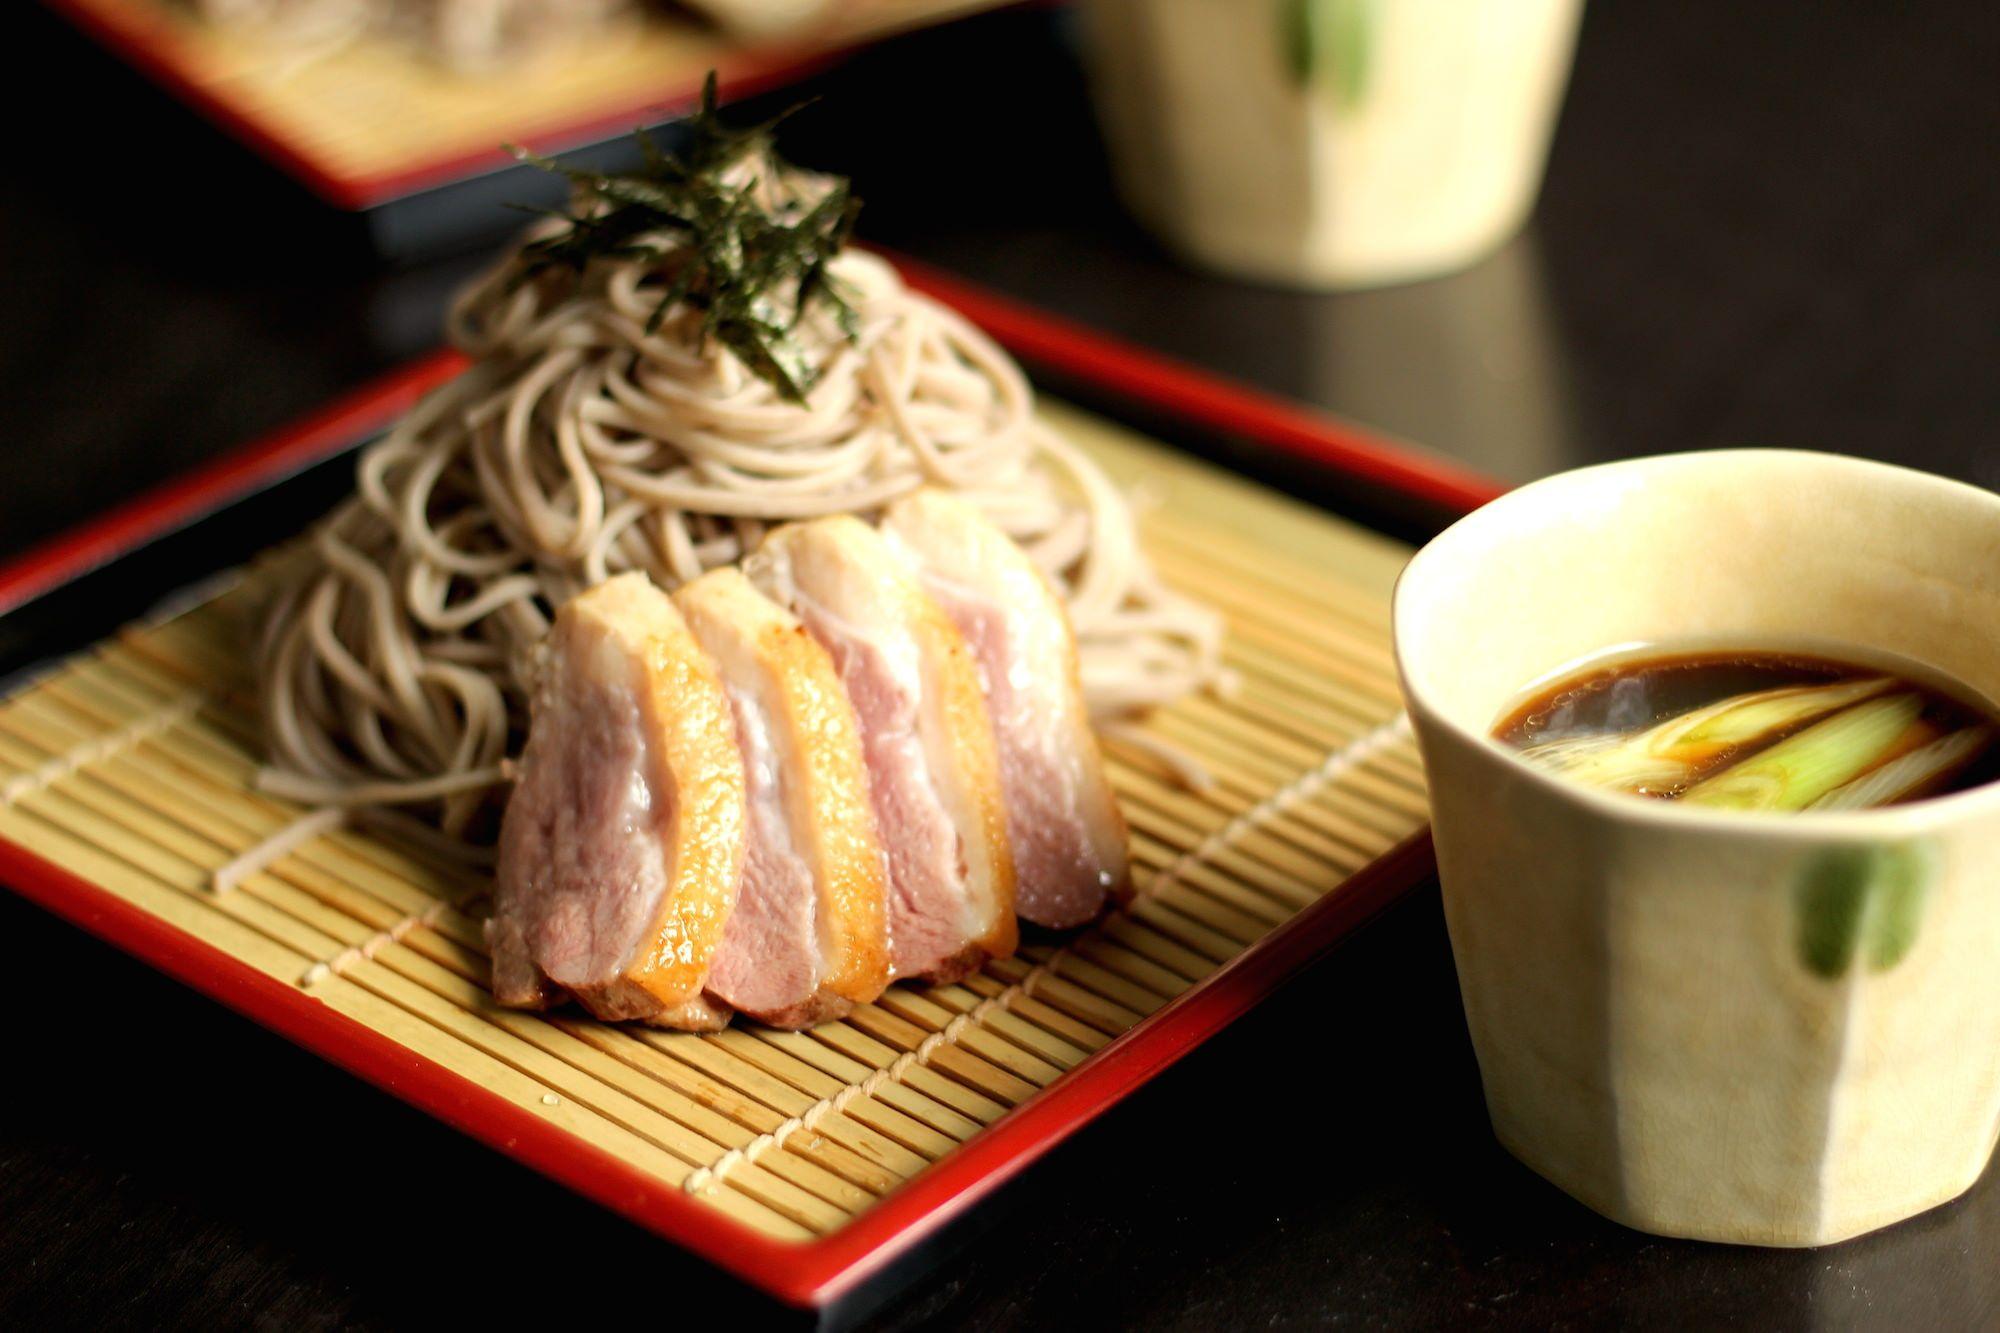 My Buckwheat Noodles w/ Duck Breast... mmmm #noodles #duck #cooking